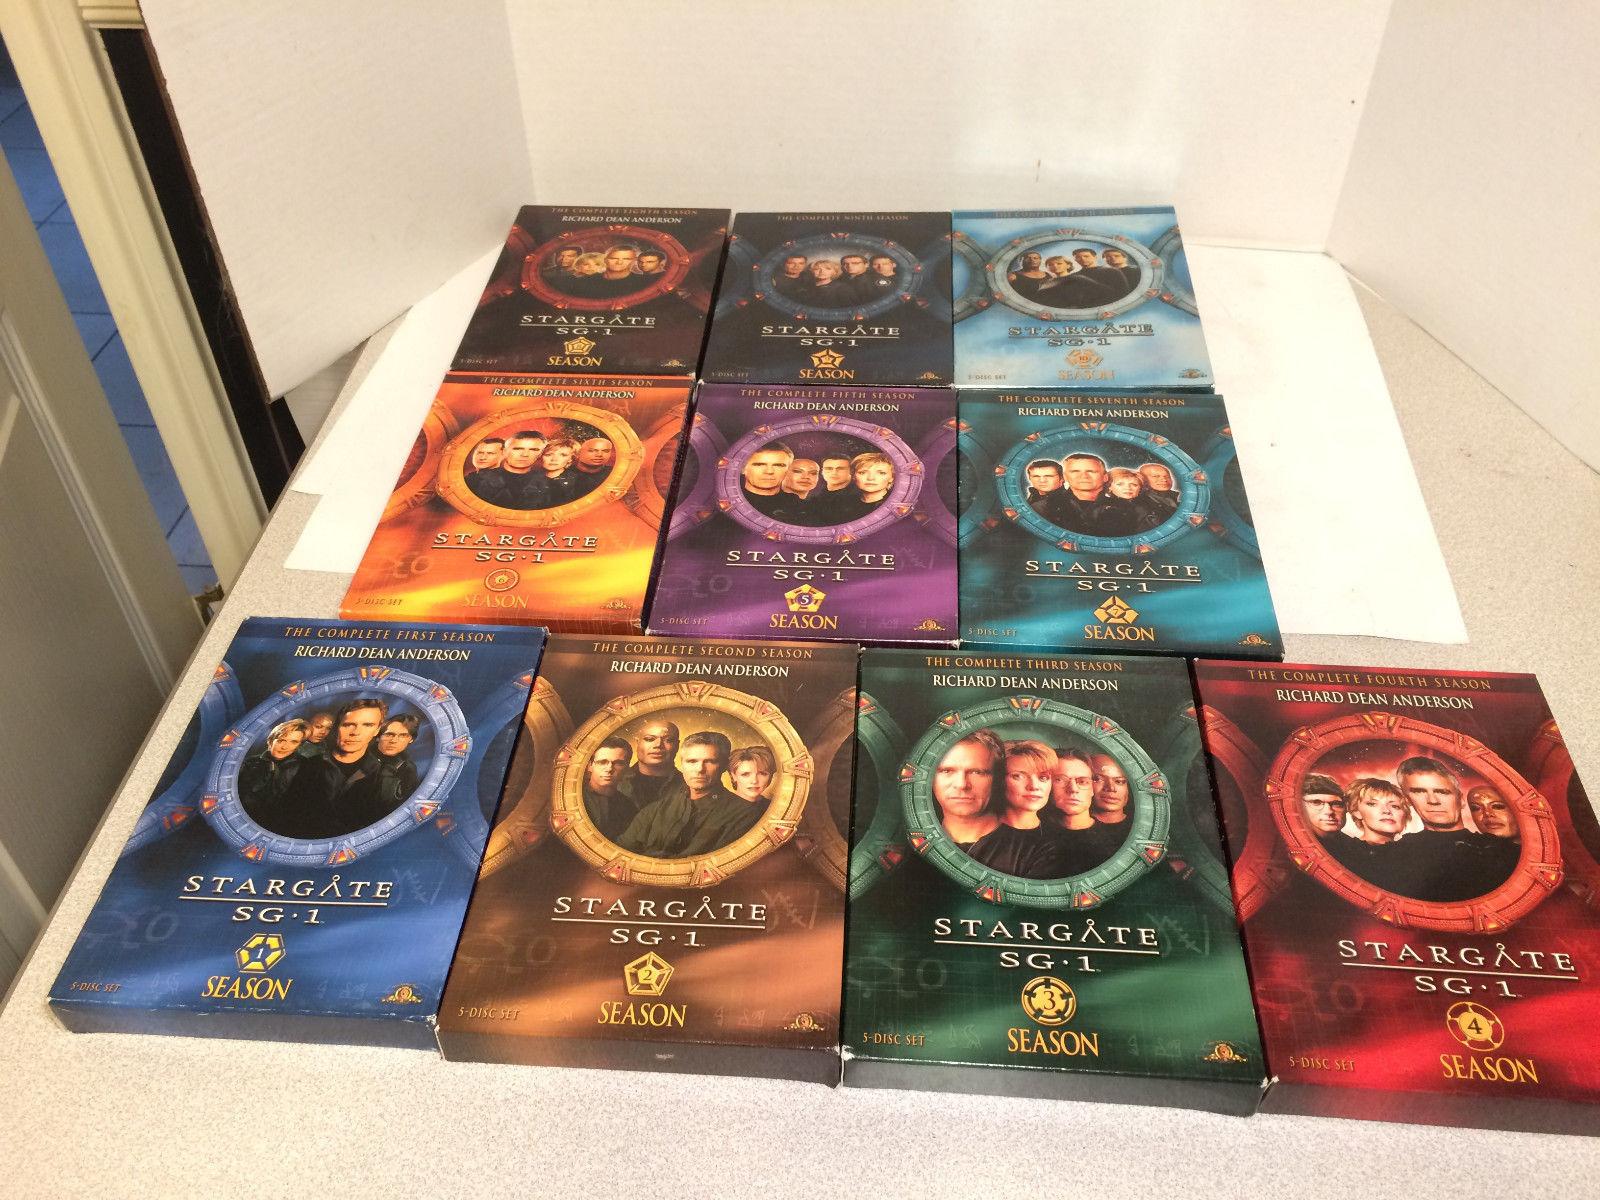 STARGATE SG-1 Complete Series Seasons 1-10 (DVD)